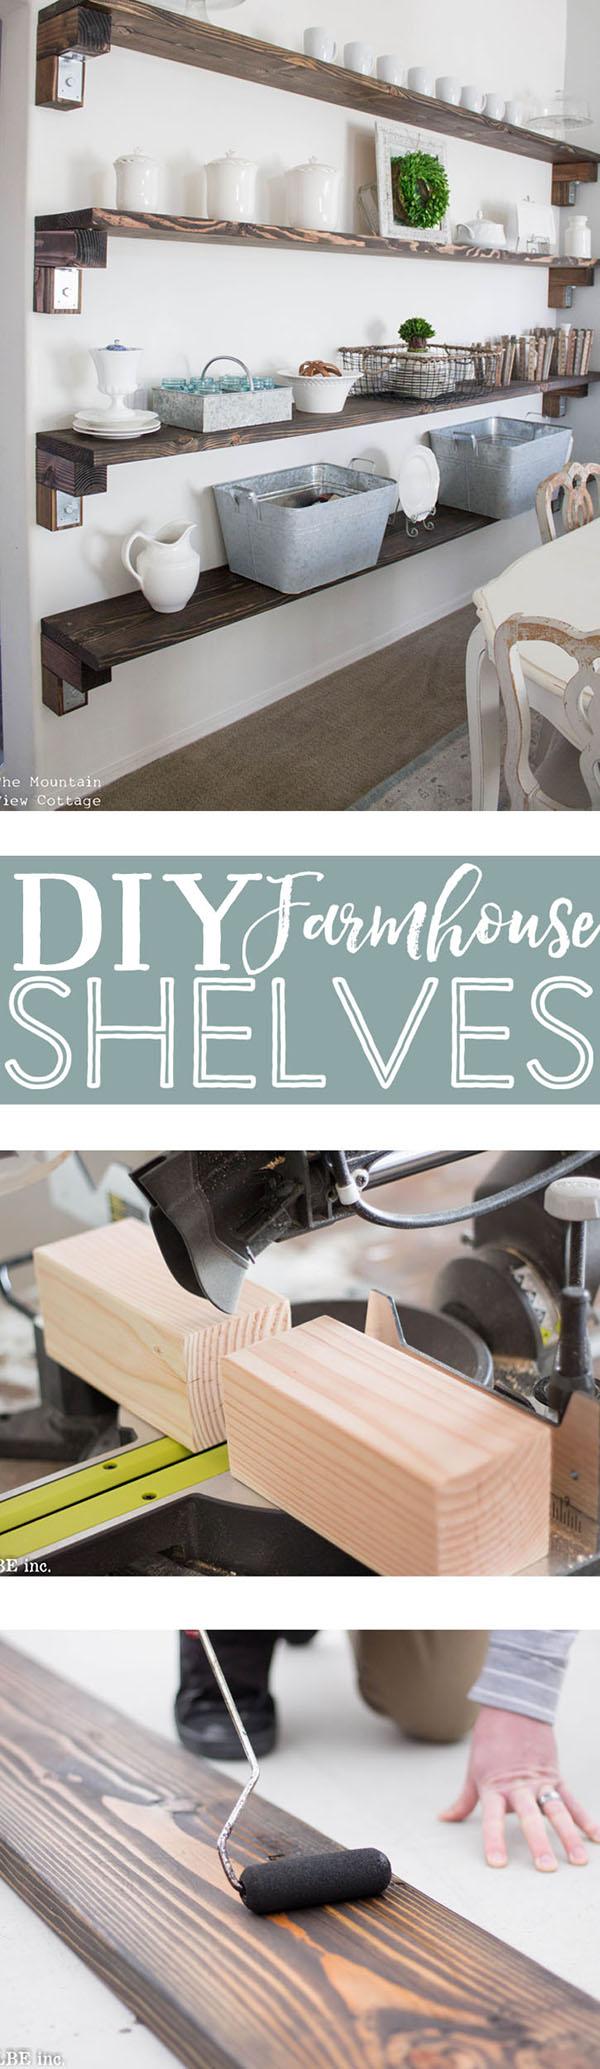 FarmhouseShelves9